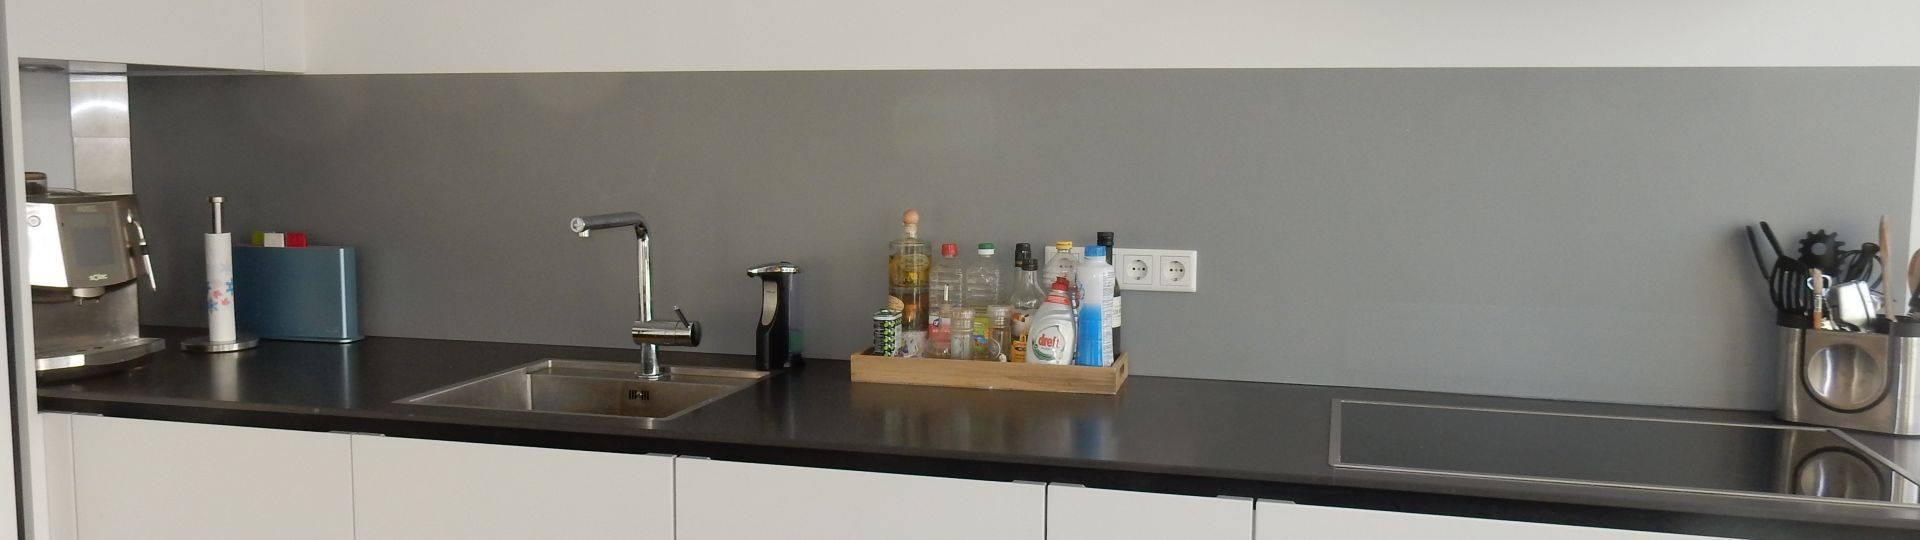 Aluminium Keuken Achterwand Kleurstalen